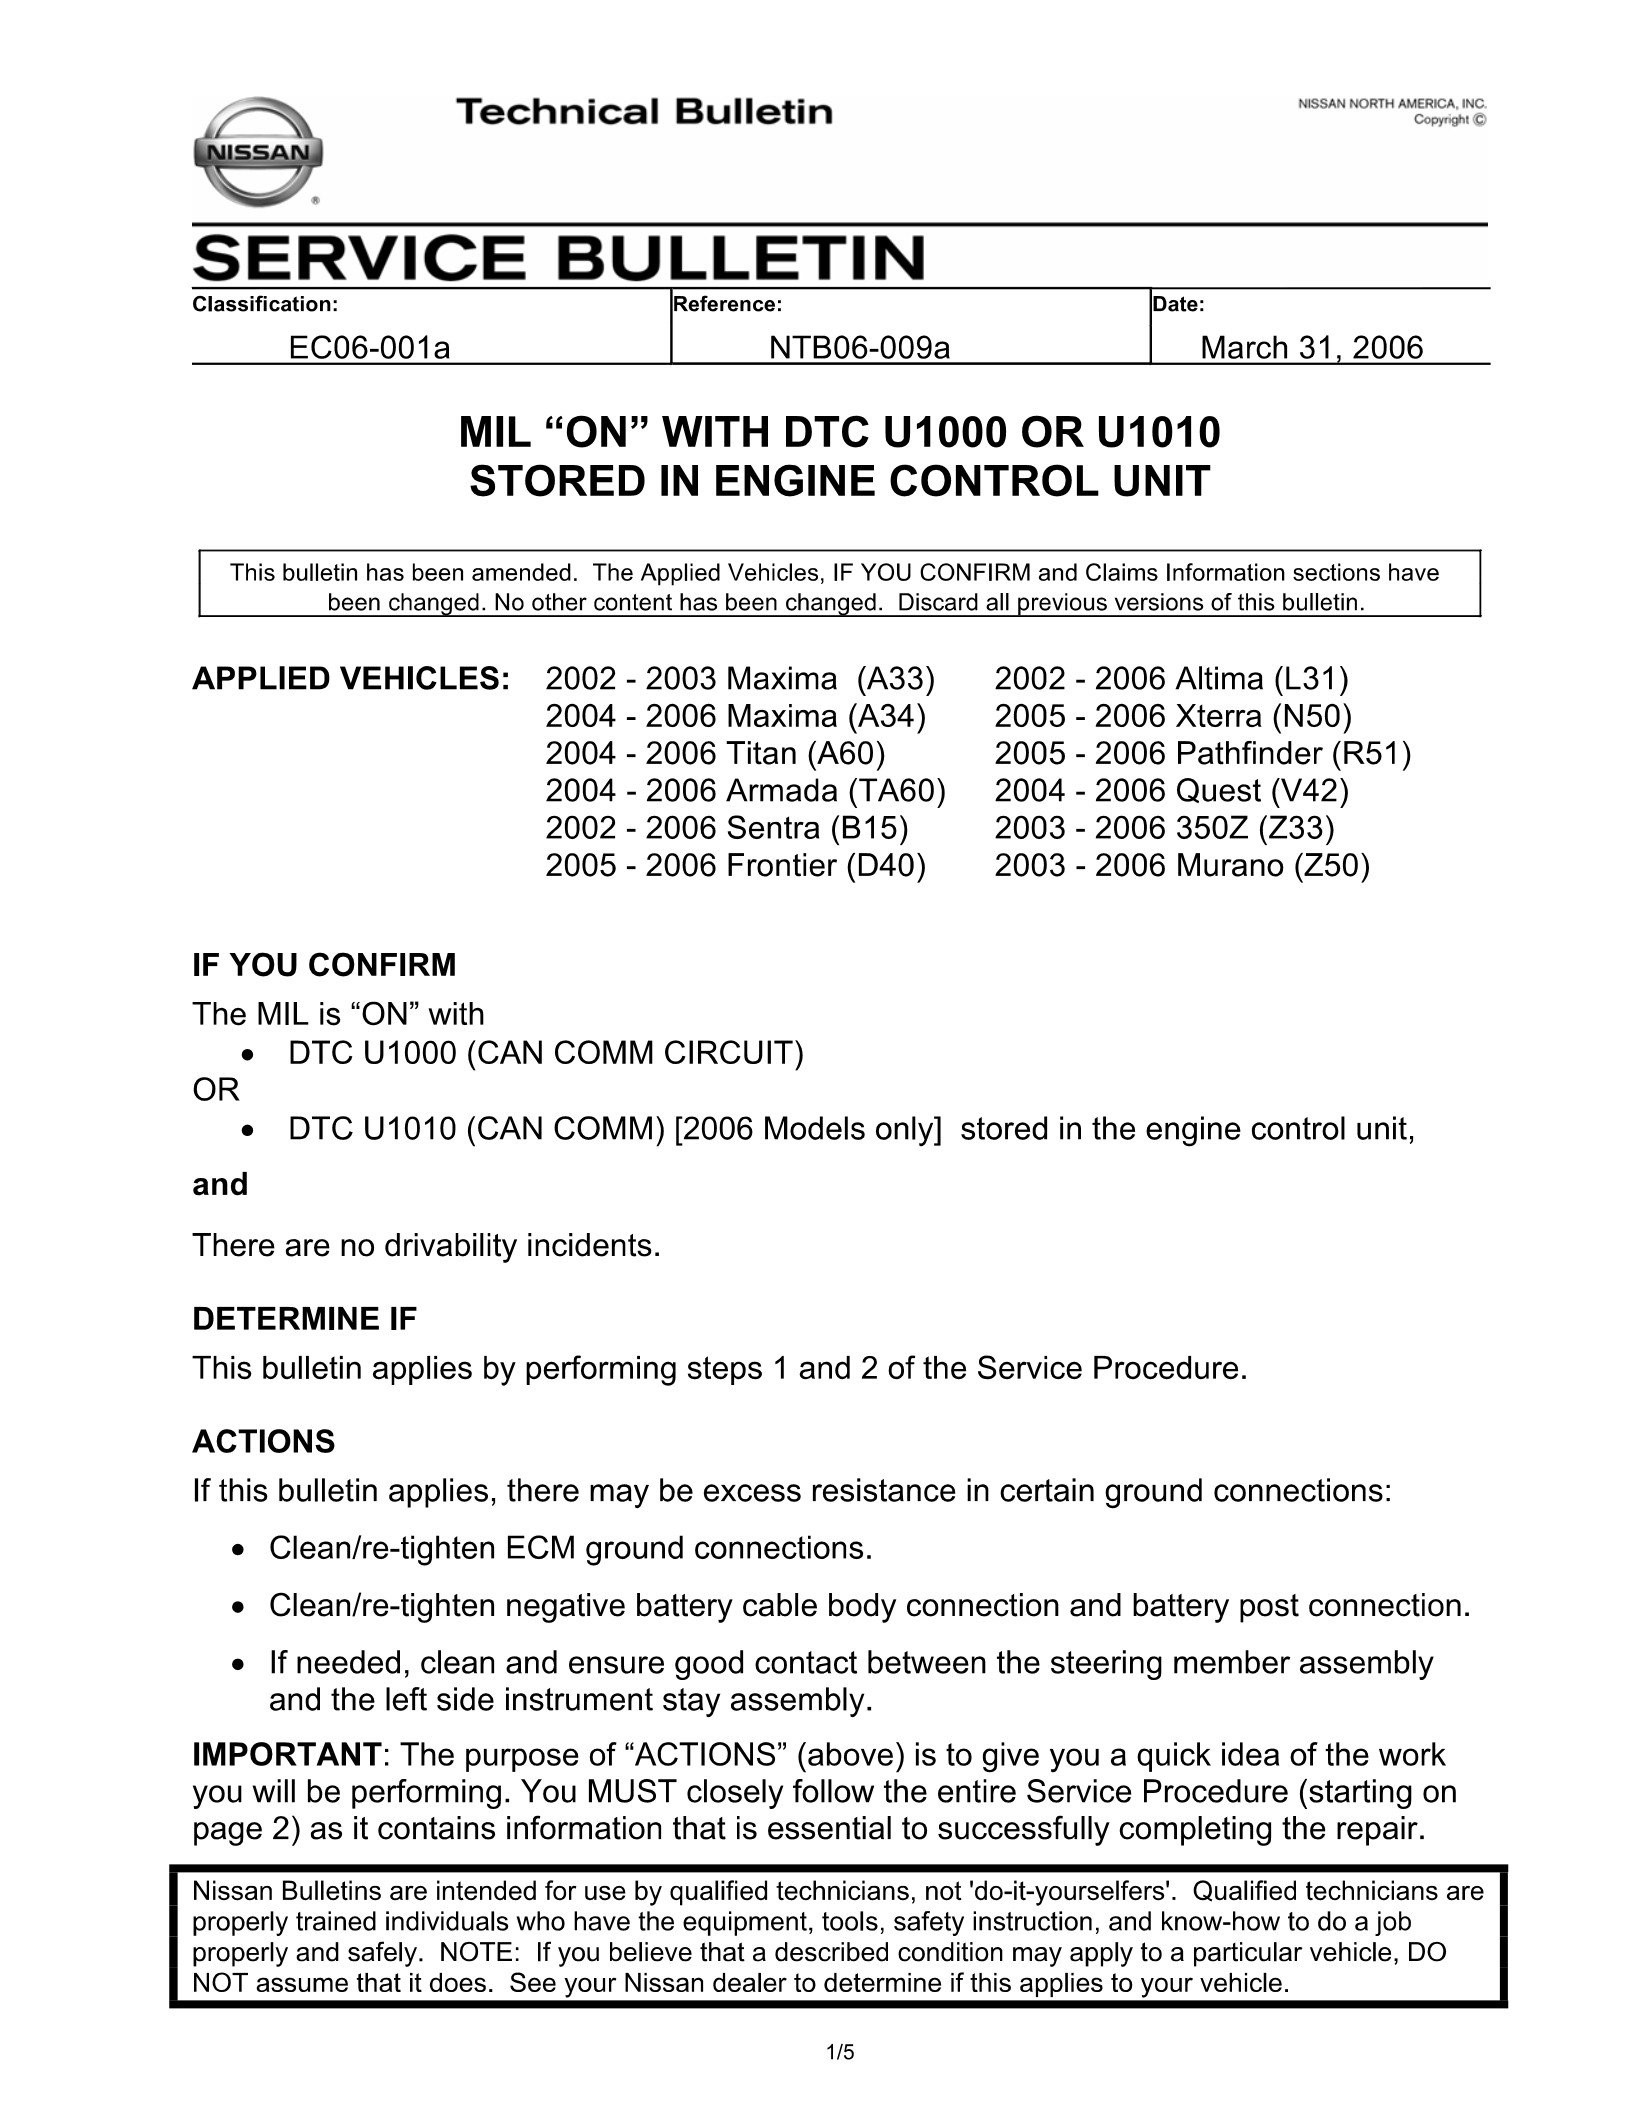 I have Diagnosis code U1001/U1000 CAN on my 2003 Nissan